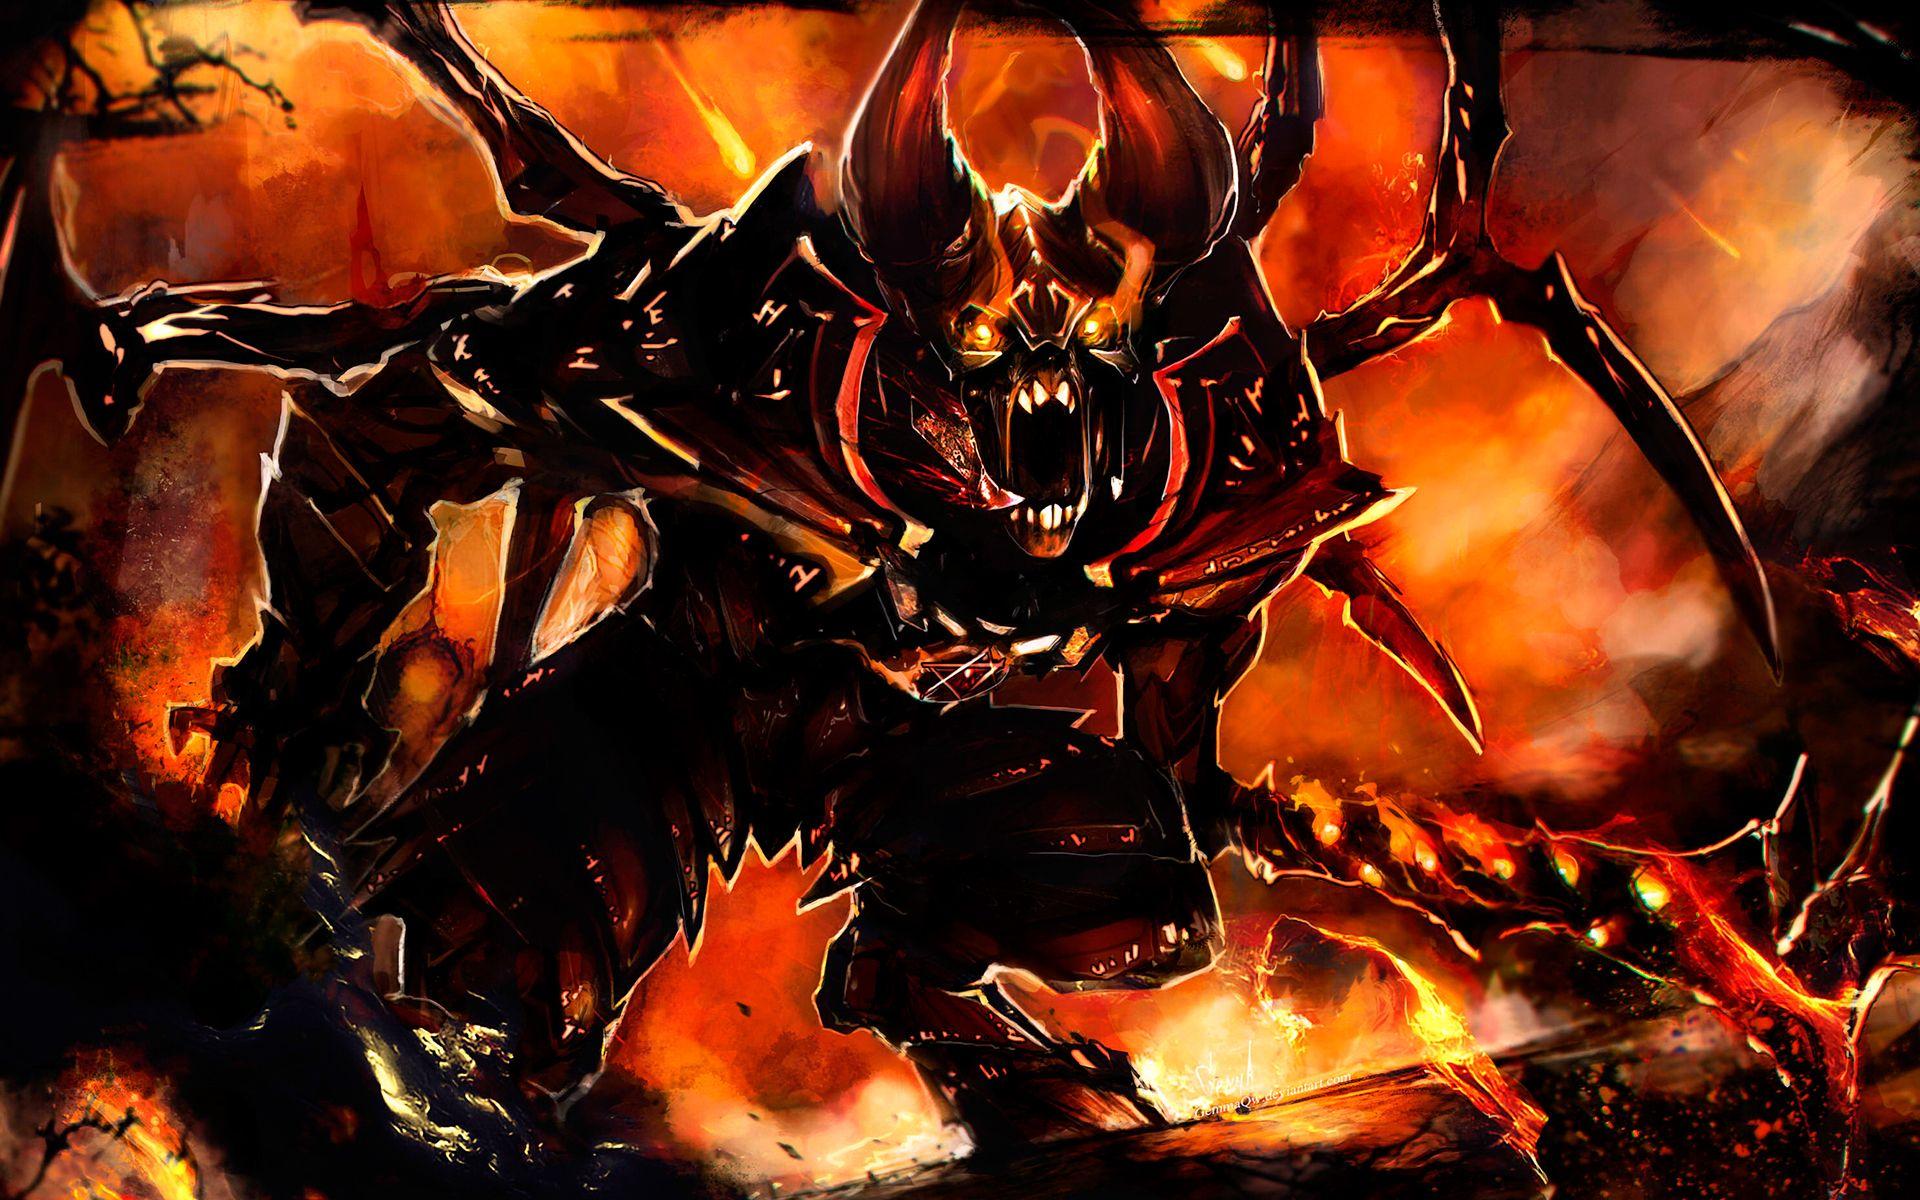 angry doom wallpaper more http dota2walls com doom angry doom